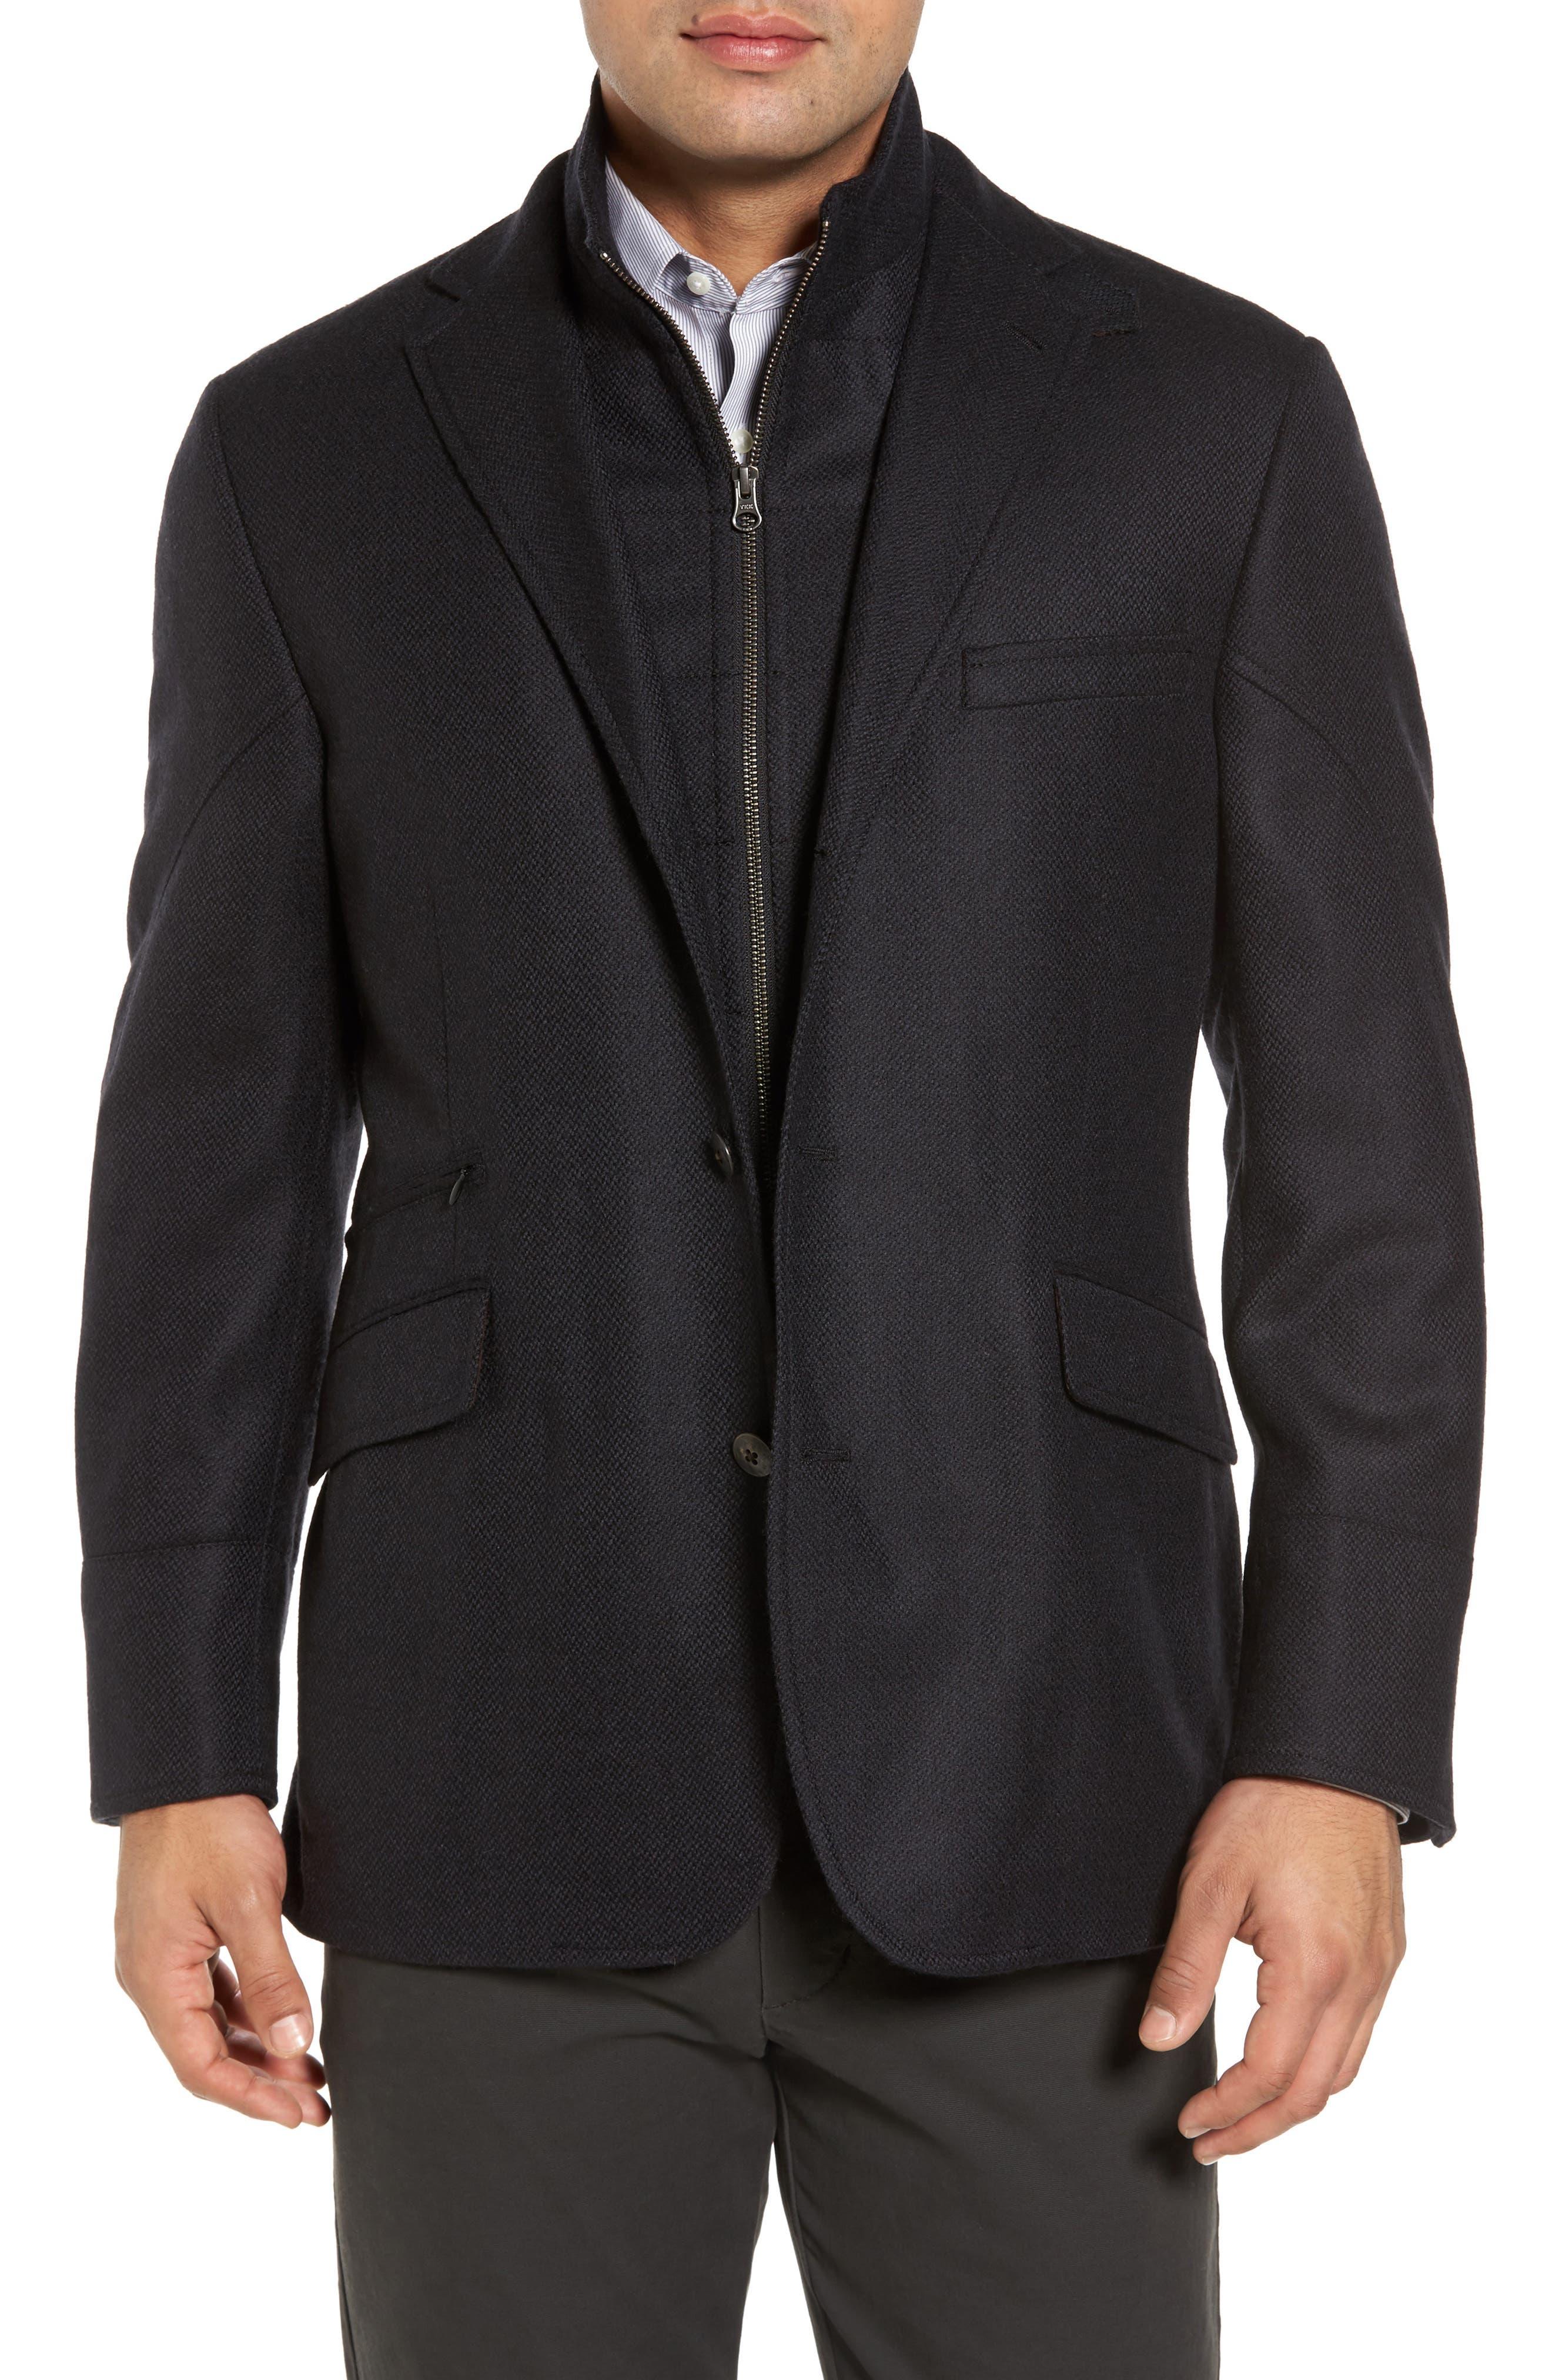 Ritchie Aim Hybrid Classic Fit Wool & Cashmere Sport Coat,                         Main,                         color, Black